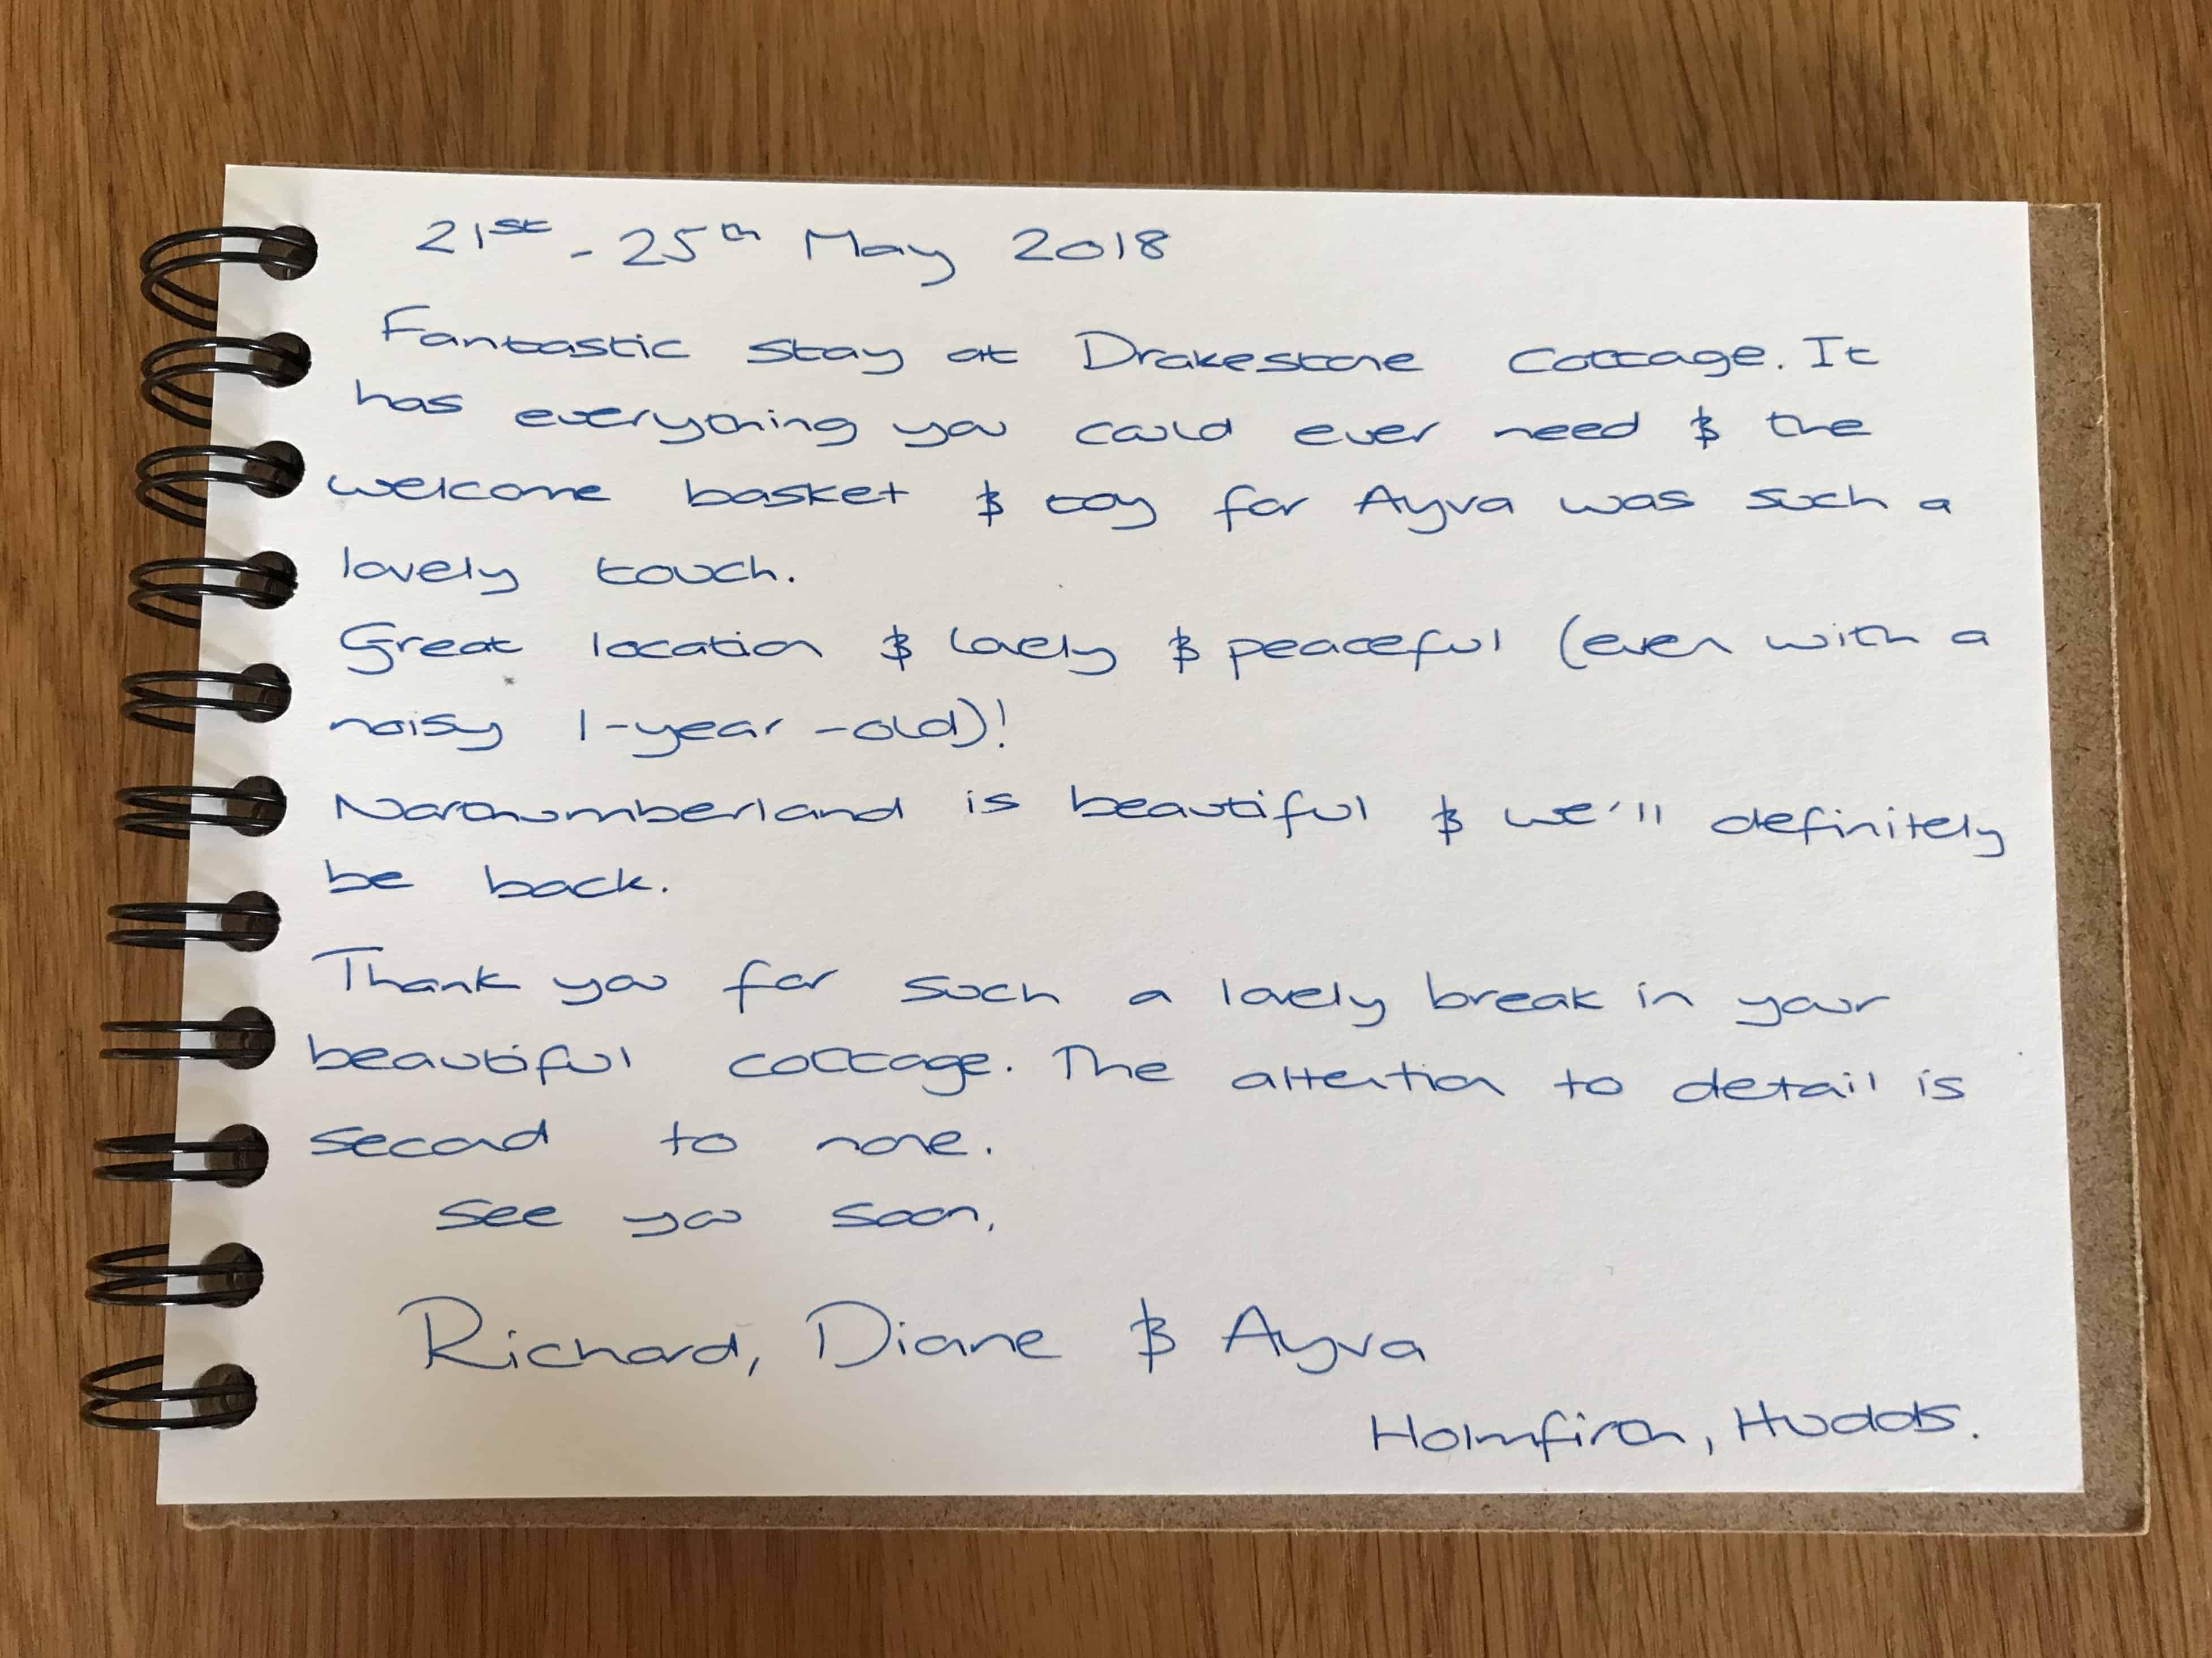 Karens Kottages - Drakestone Cottage in Northumberland - customer feedback - guest book - dog friendly